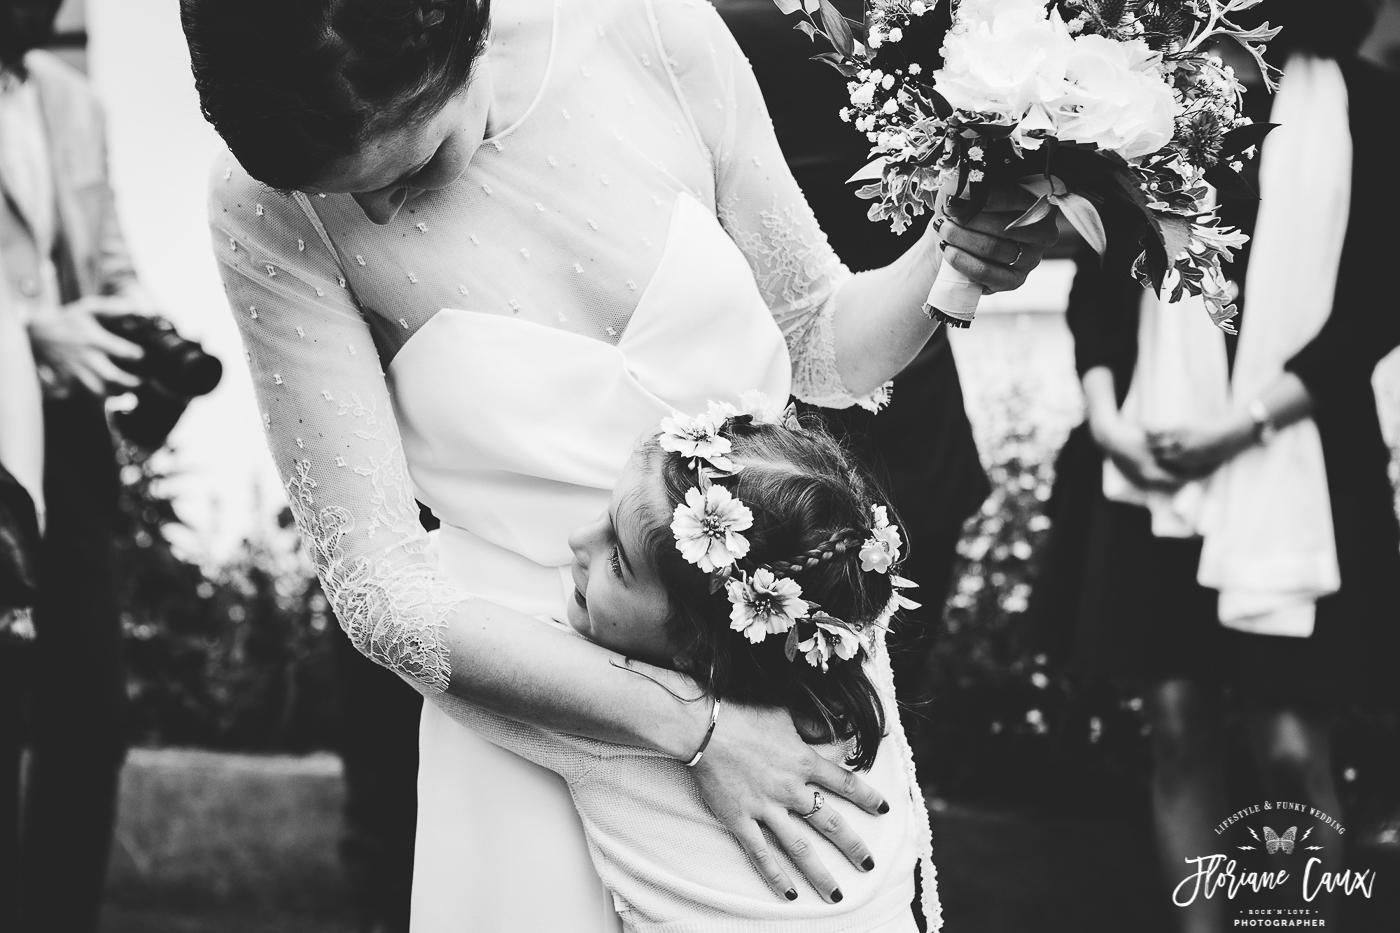 photographe-mariage-pays-basque-Floriane-Caux (23)